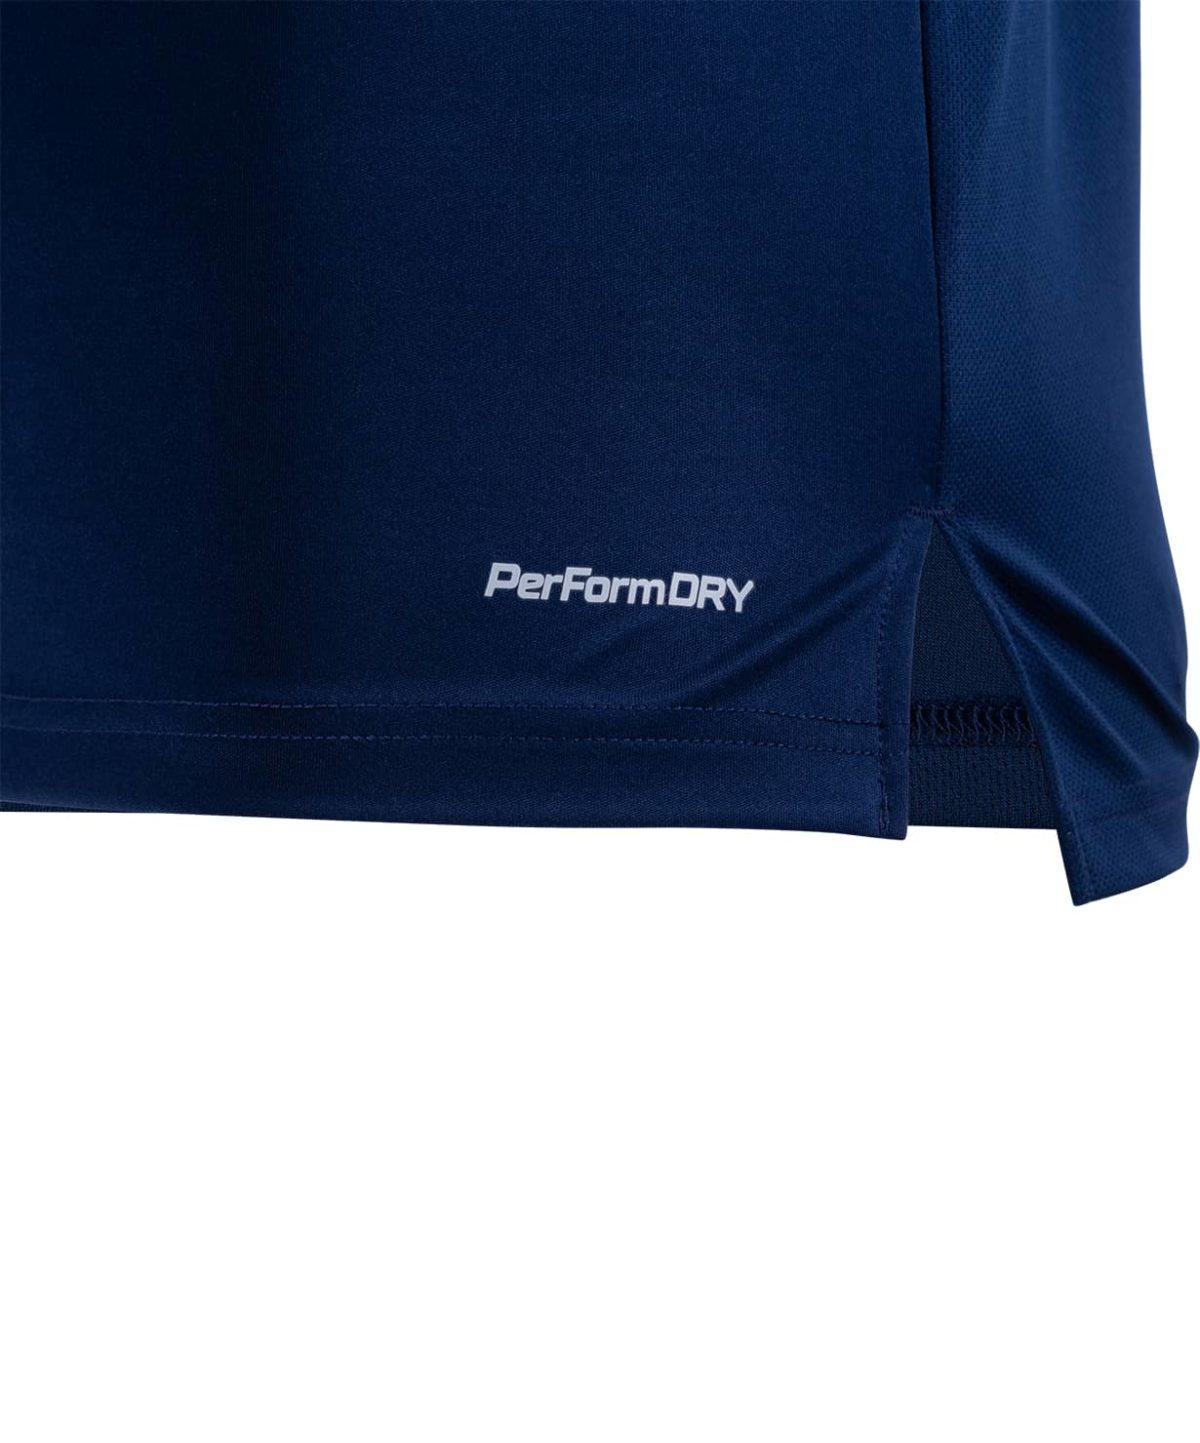 JOGEL DIVISION футболка футбольная Union Jersey: т.синий/синий/белый - 4